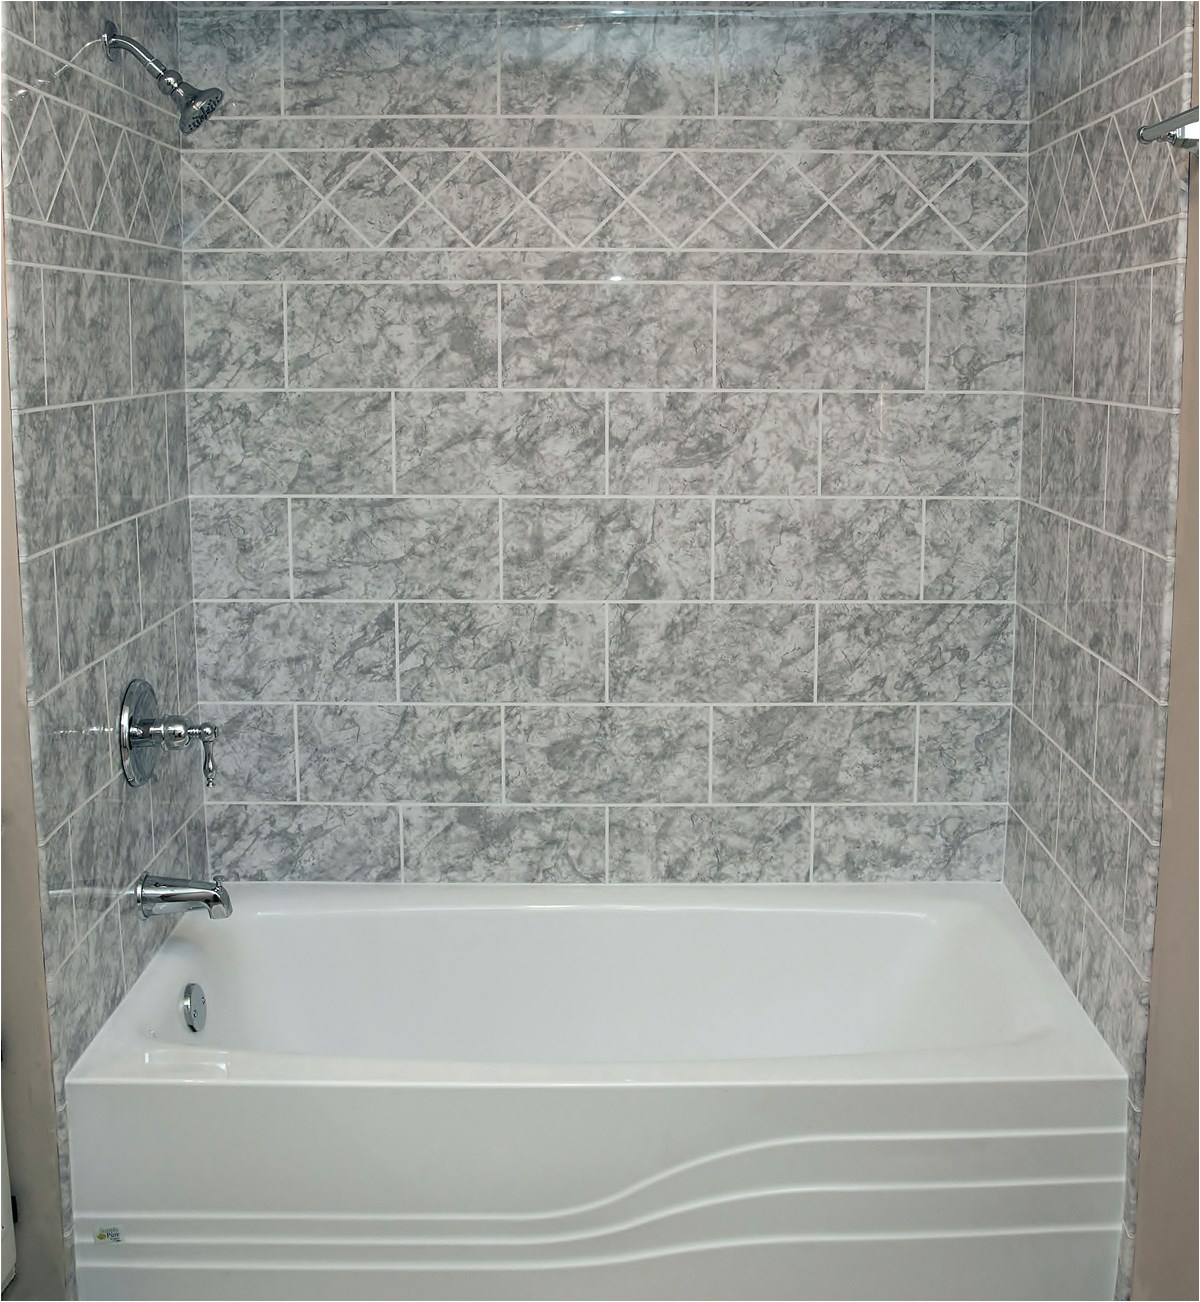 Bathtub Enclosure Panels Shower Surrounds north Texas Shower Wall Panels